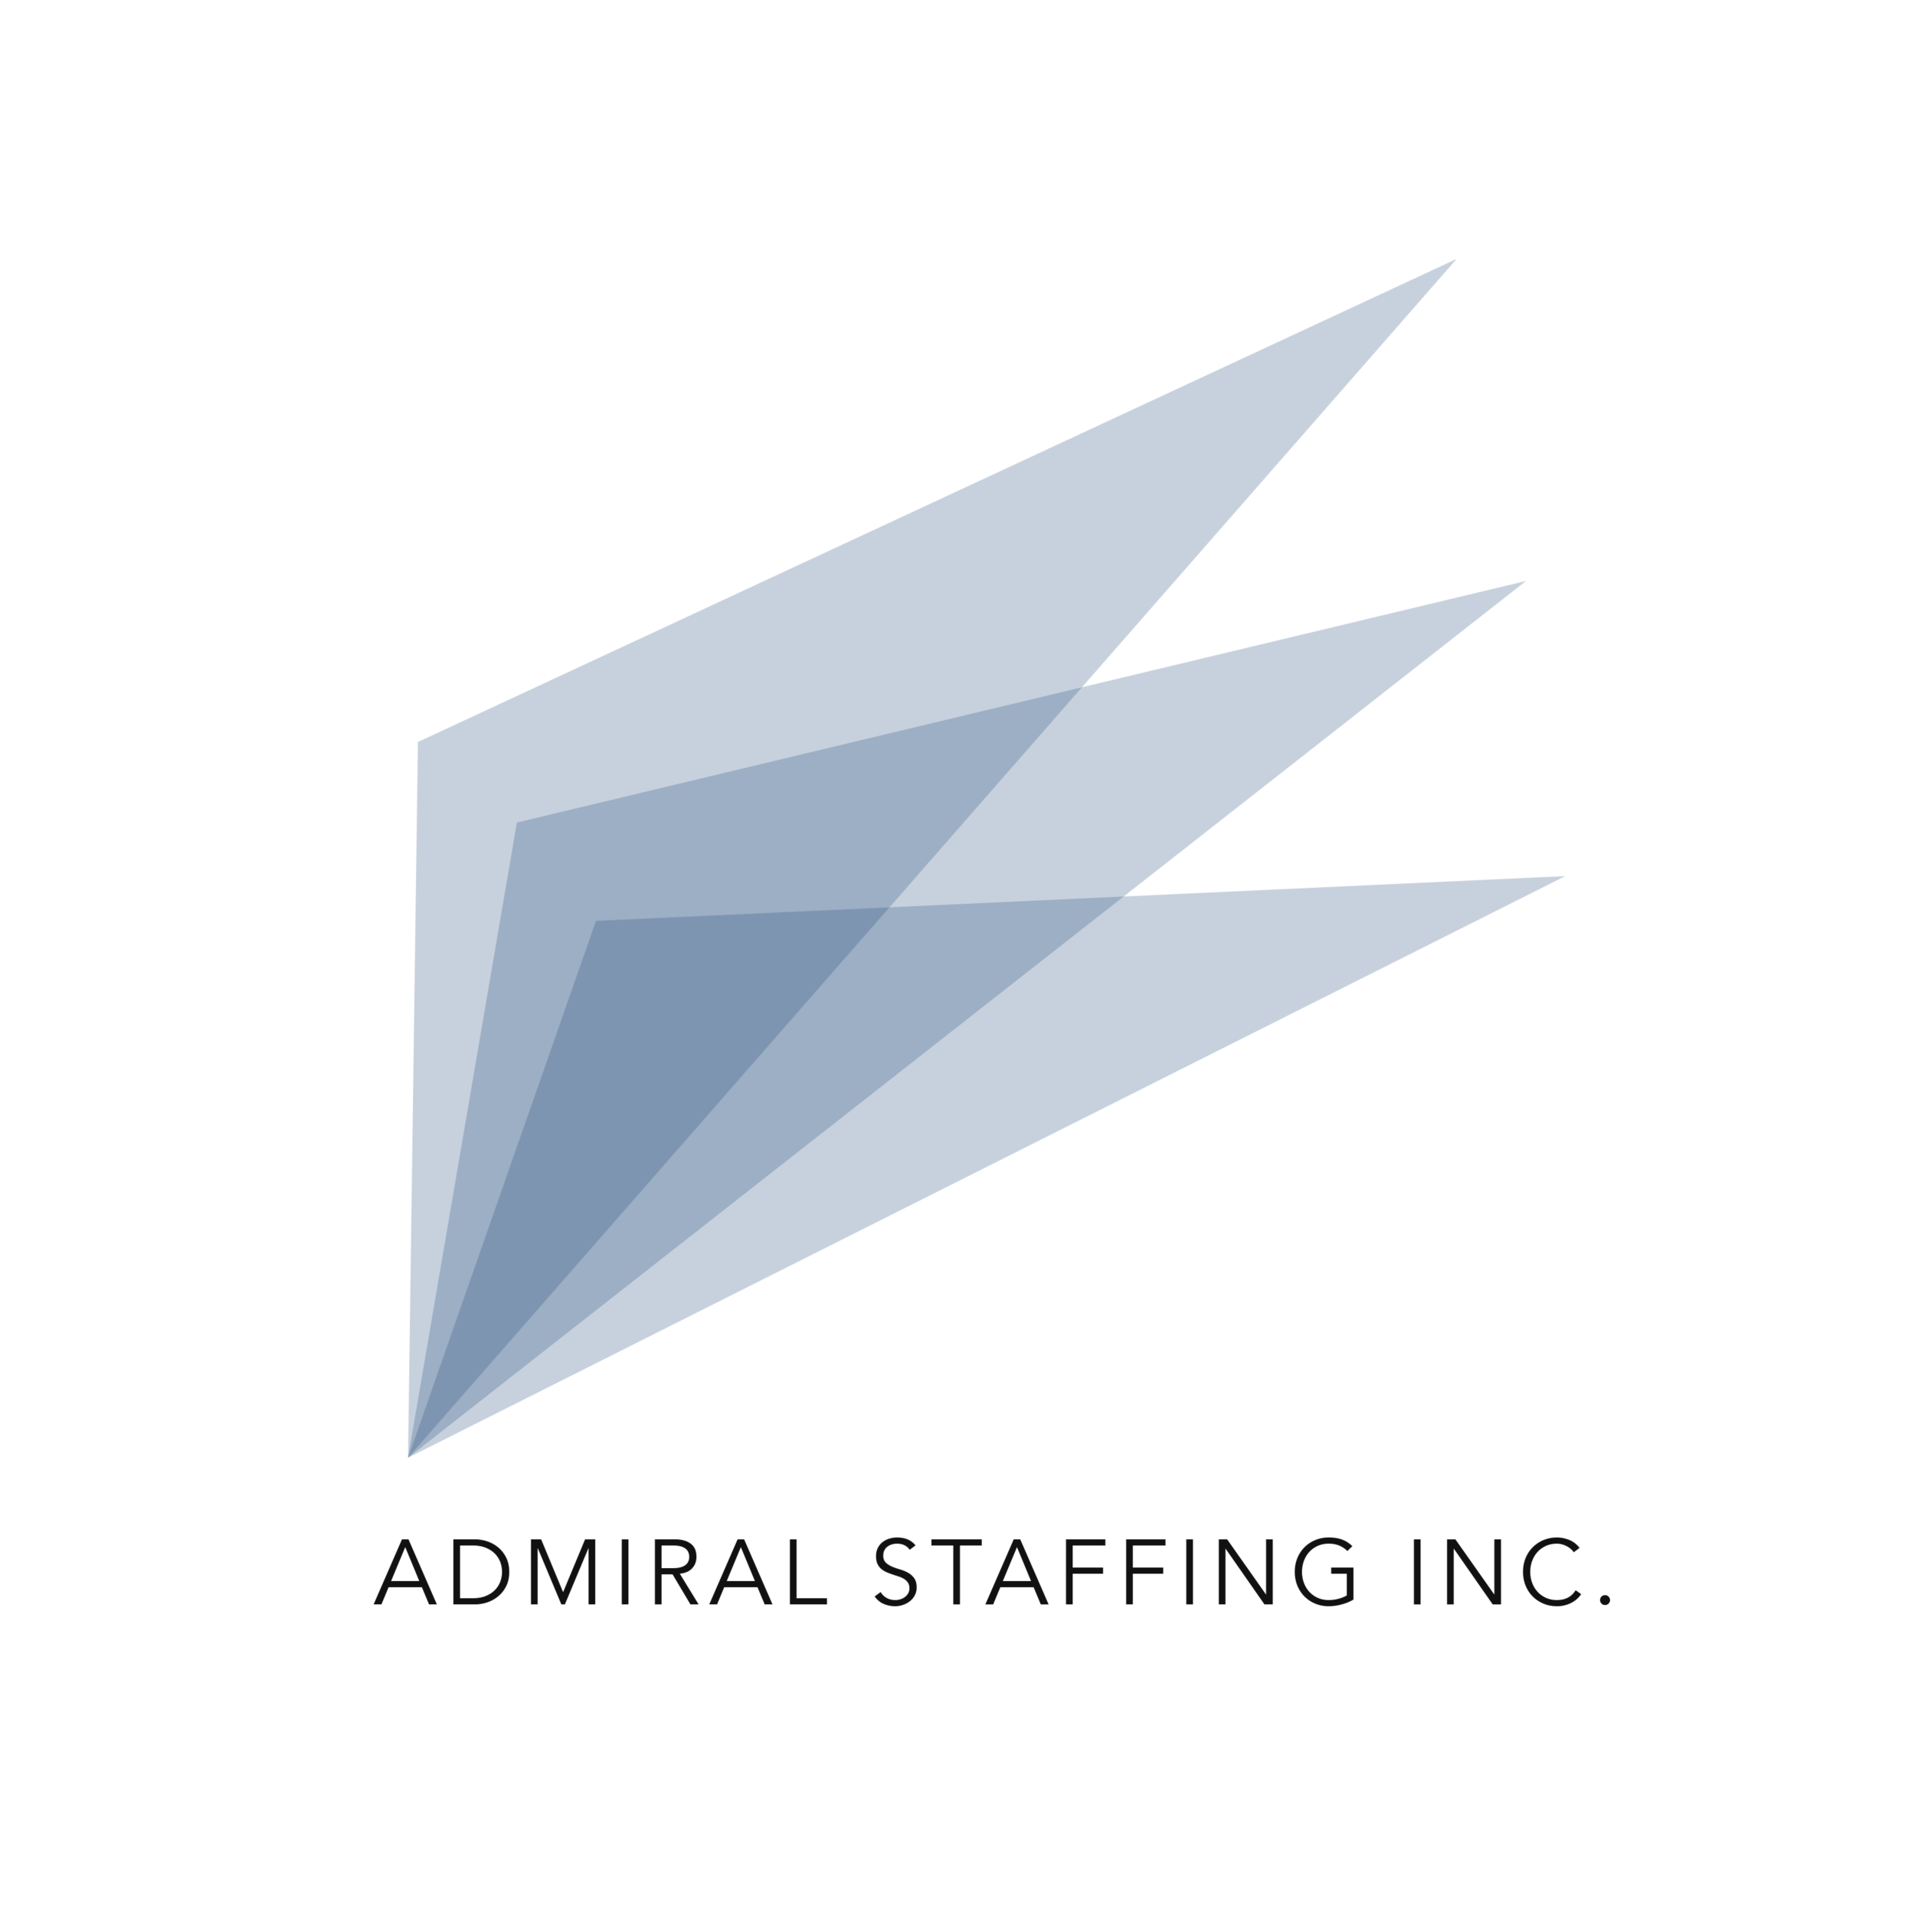 Admiral_Logo5_FINAL.png